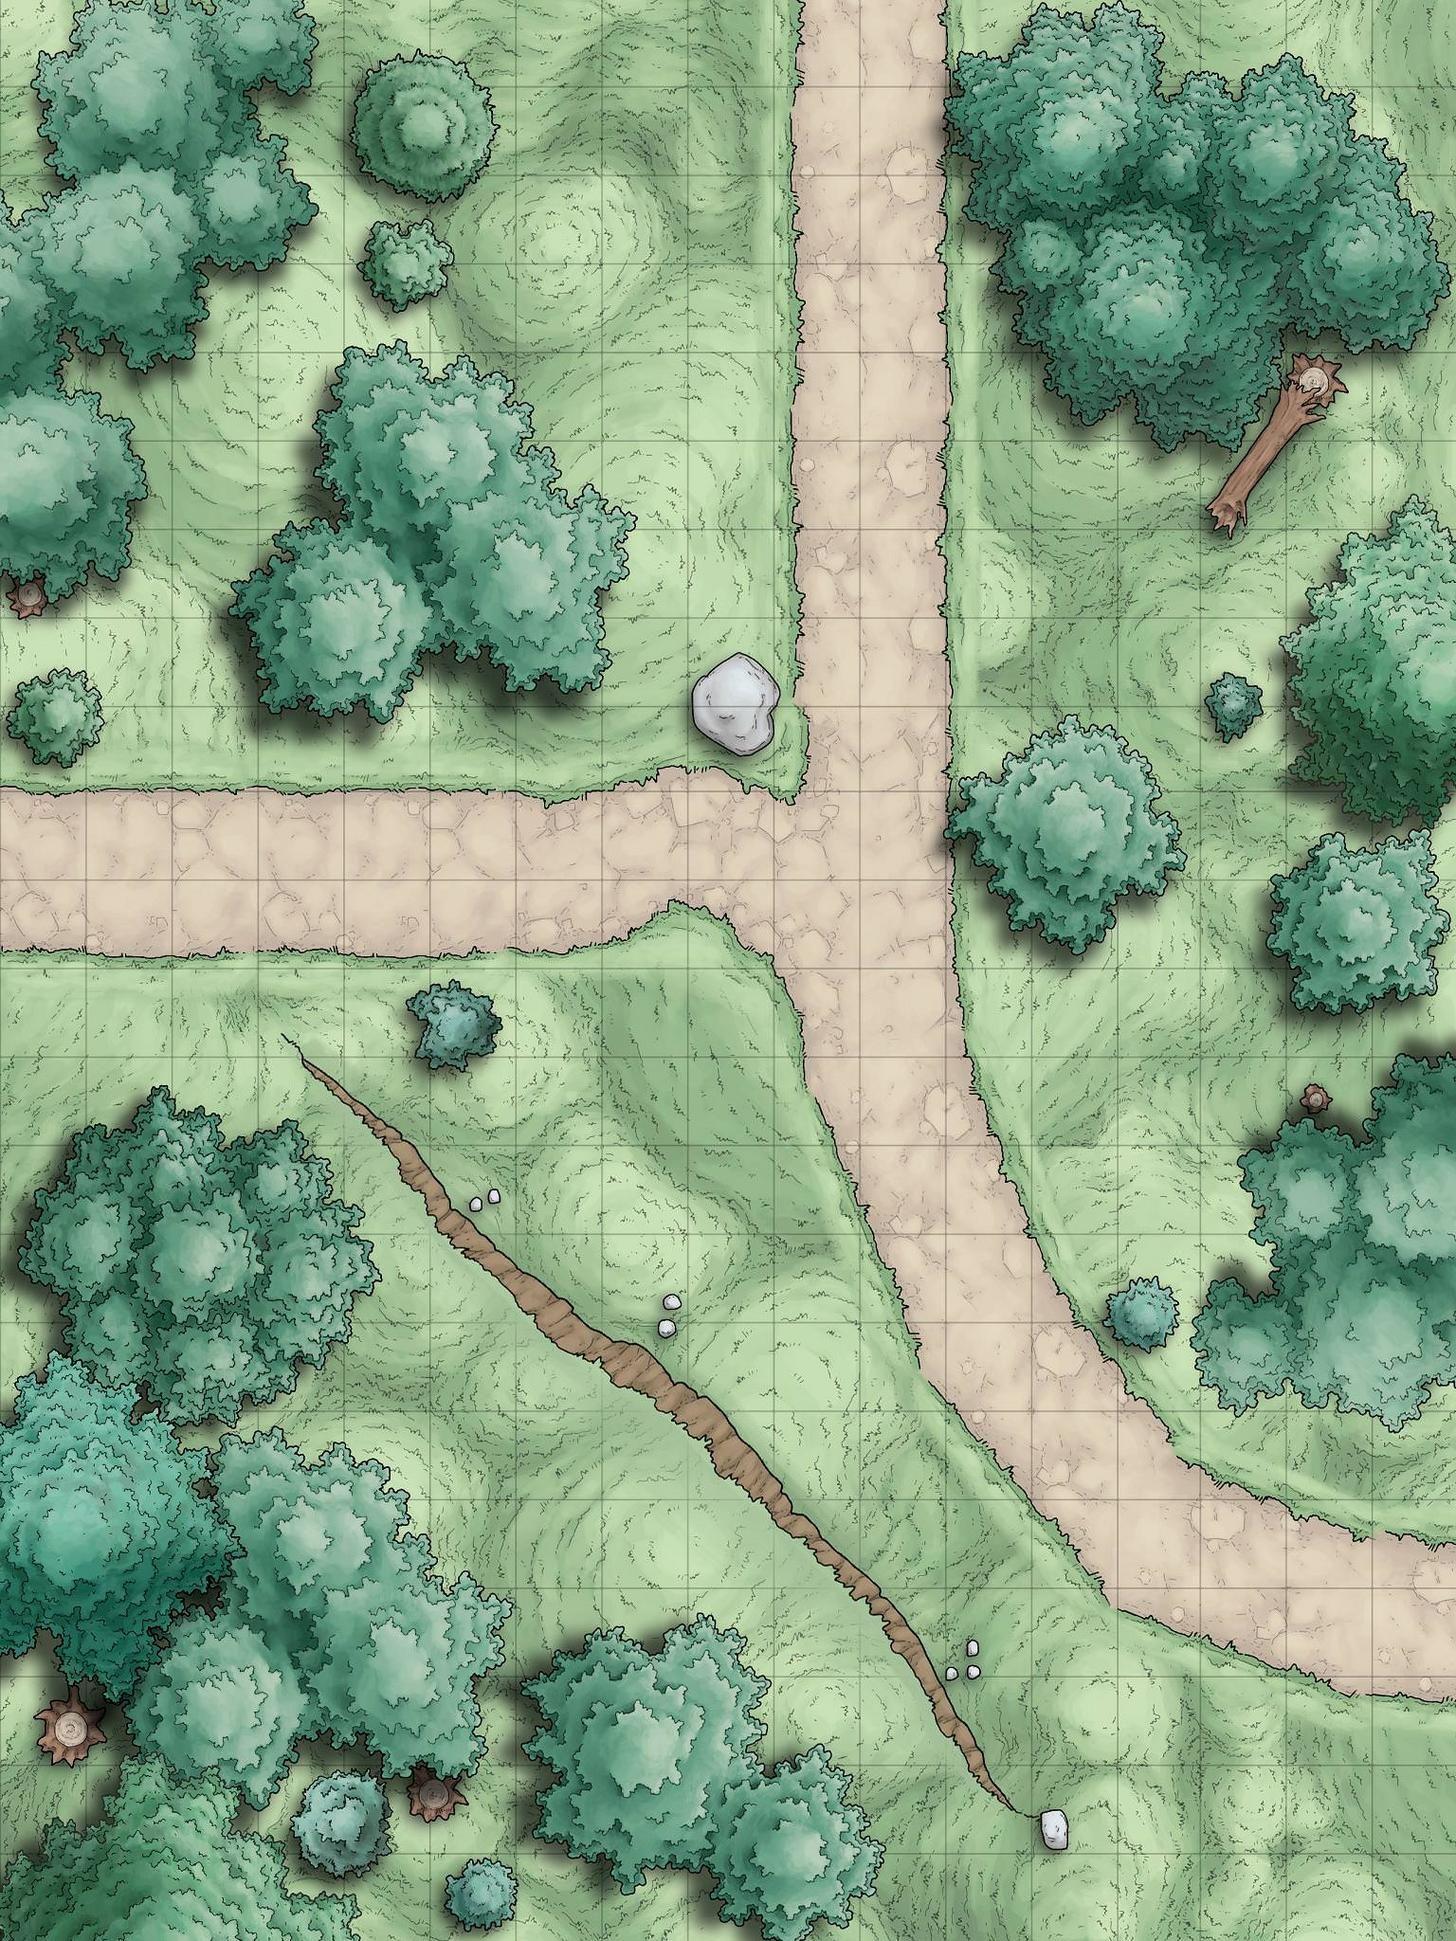 Deciduous forest Road e, n, w, hills Random Encounter Battle Maps - Album on Imgur